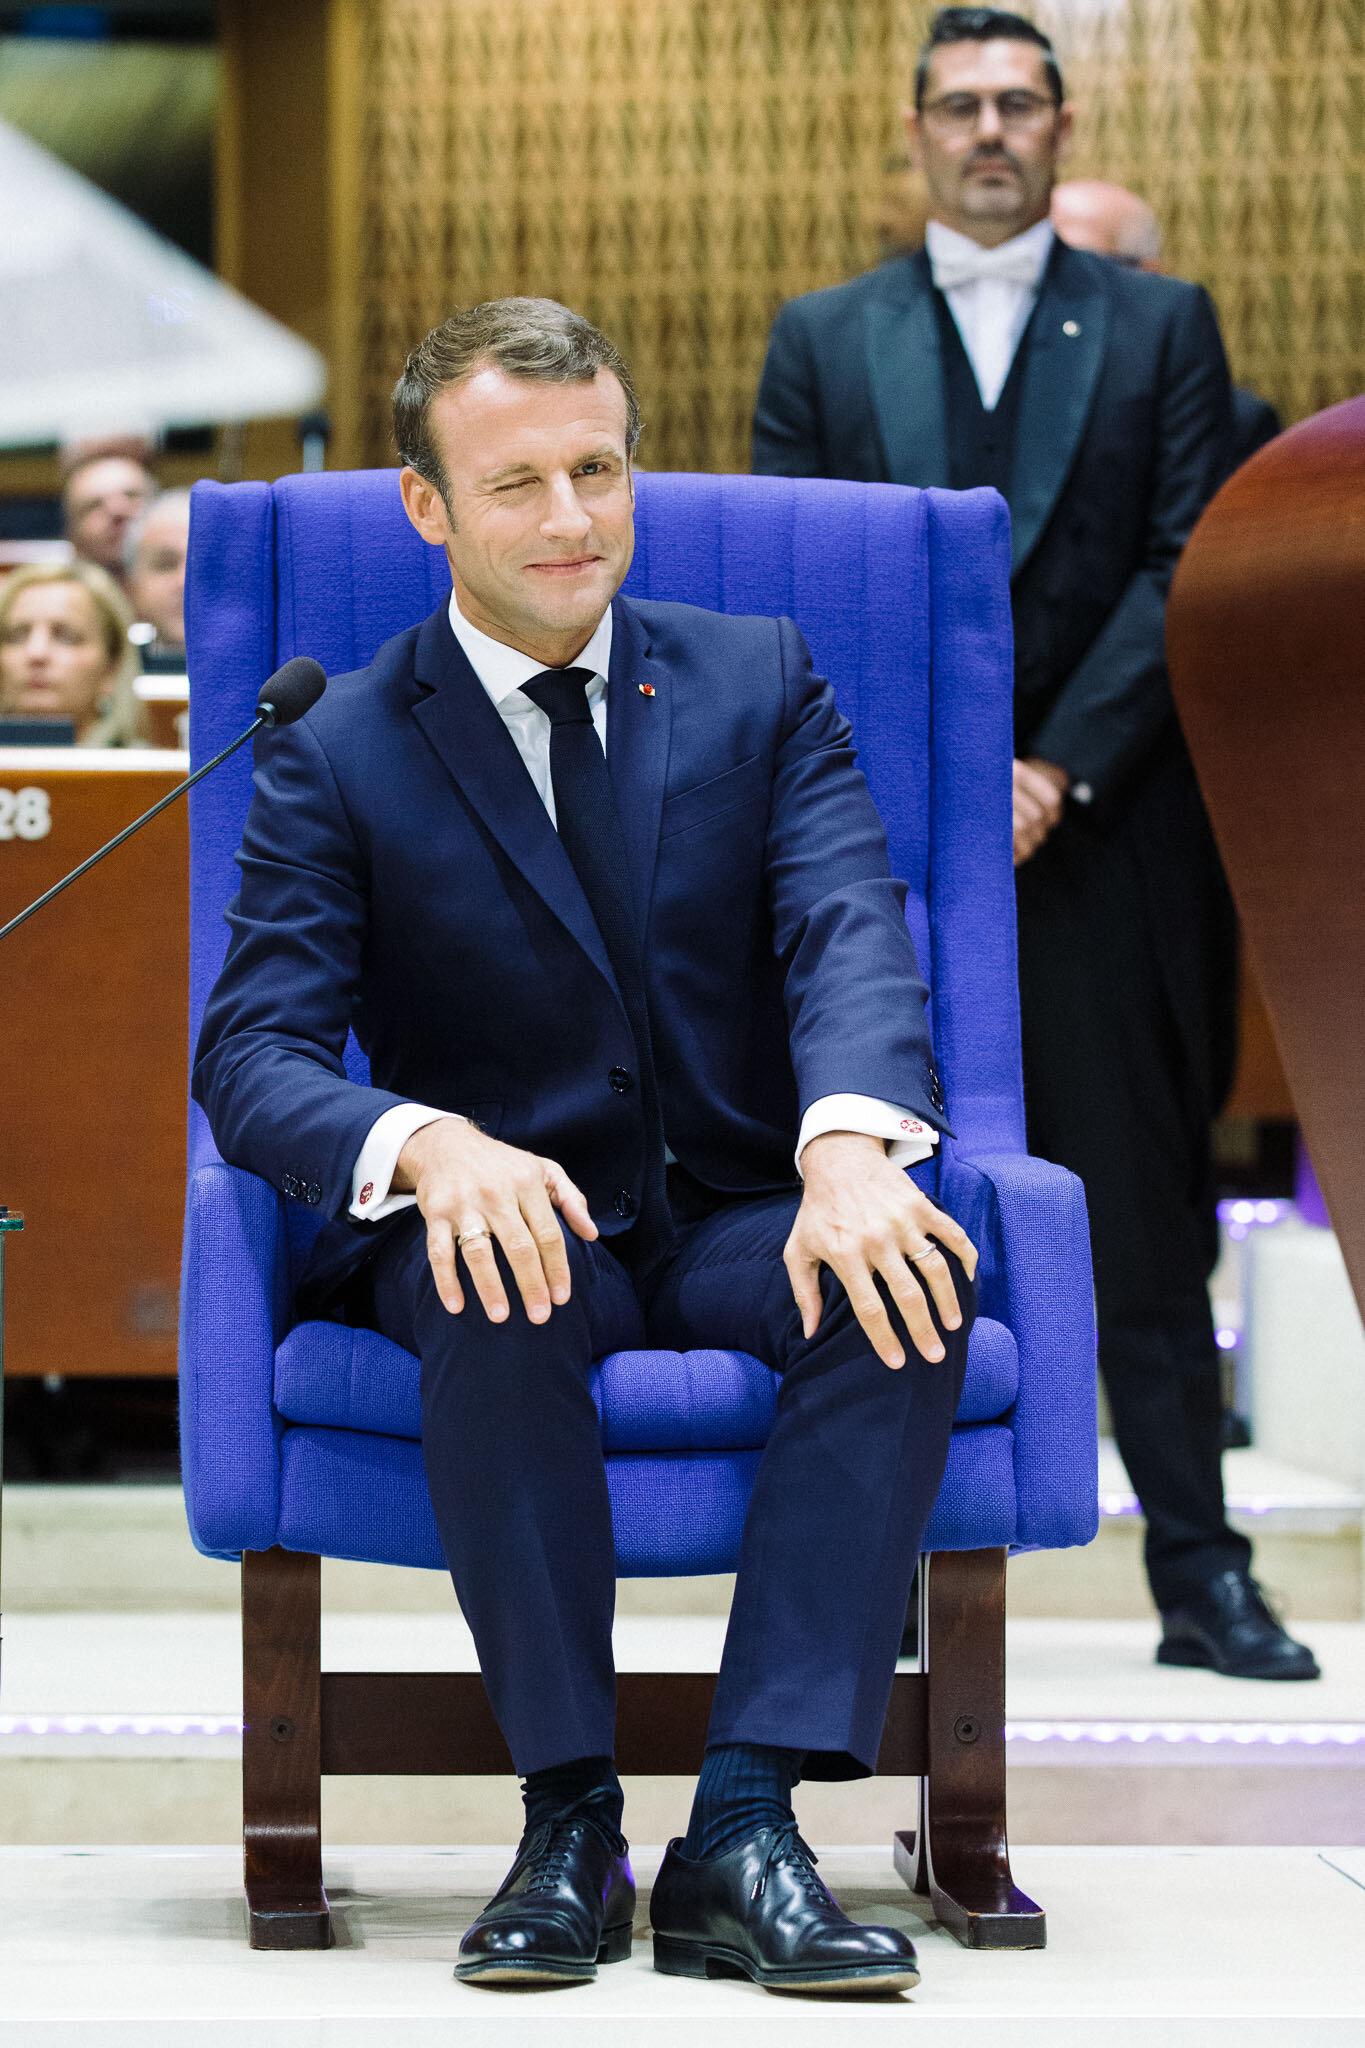 FRANCE - STRASBOURG - POLITIC - EMMANUEL MACRON AT THE COUNCIL O